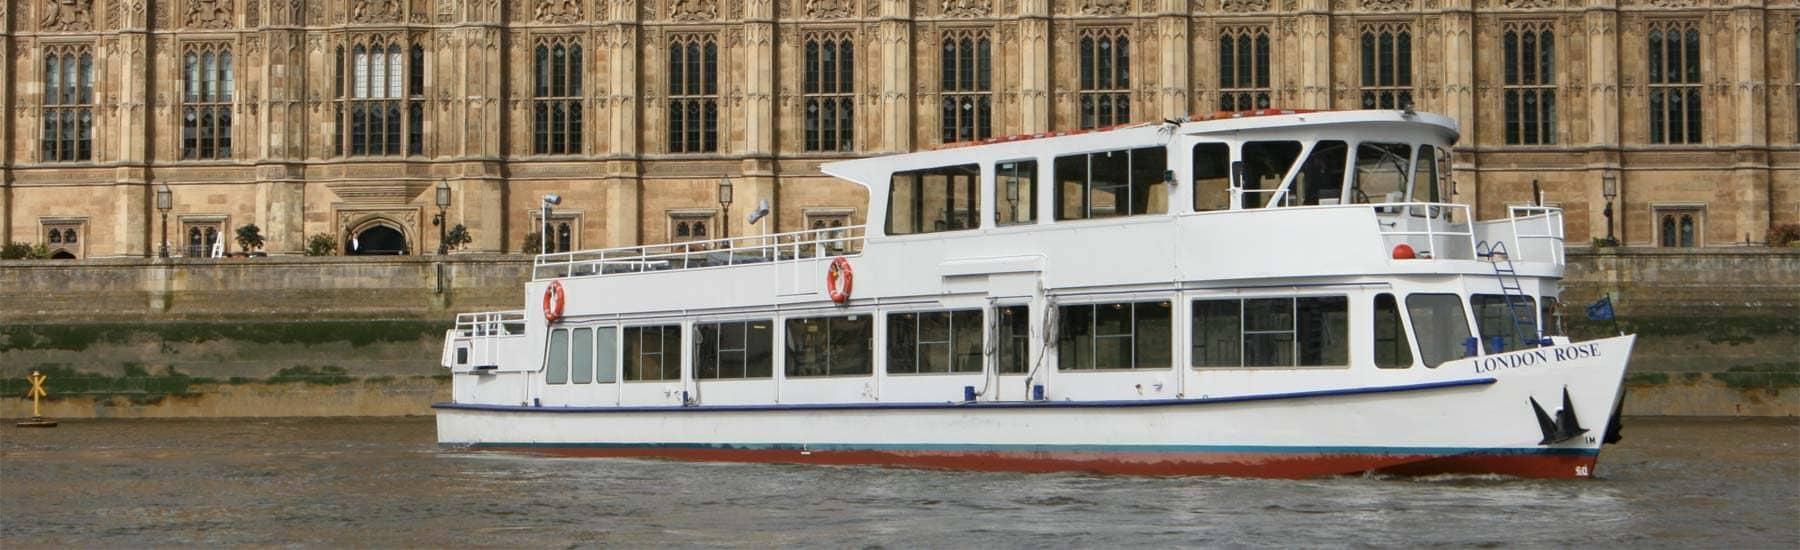 Our Fleet, M.V London Rose at Westminster